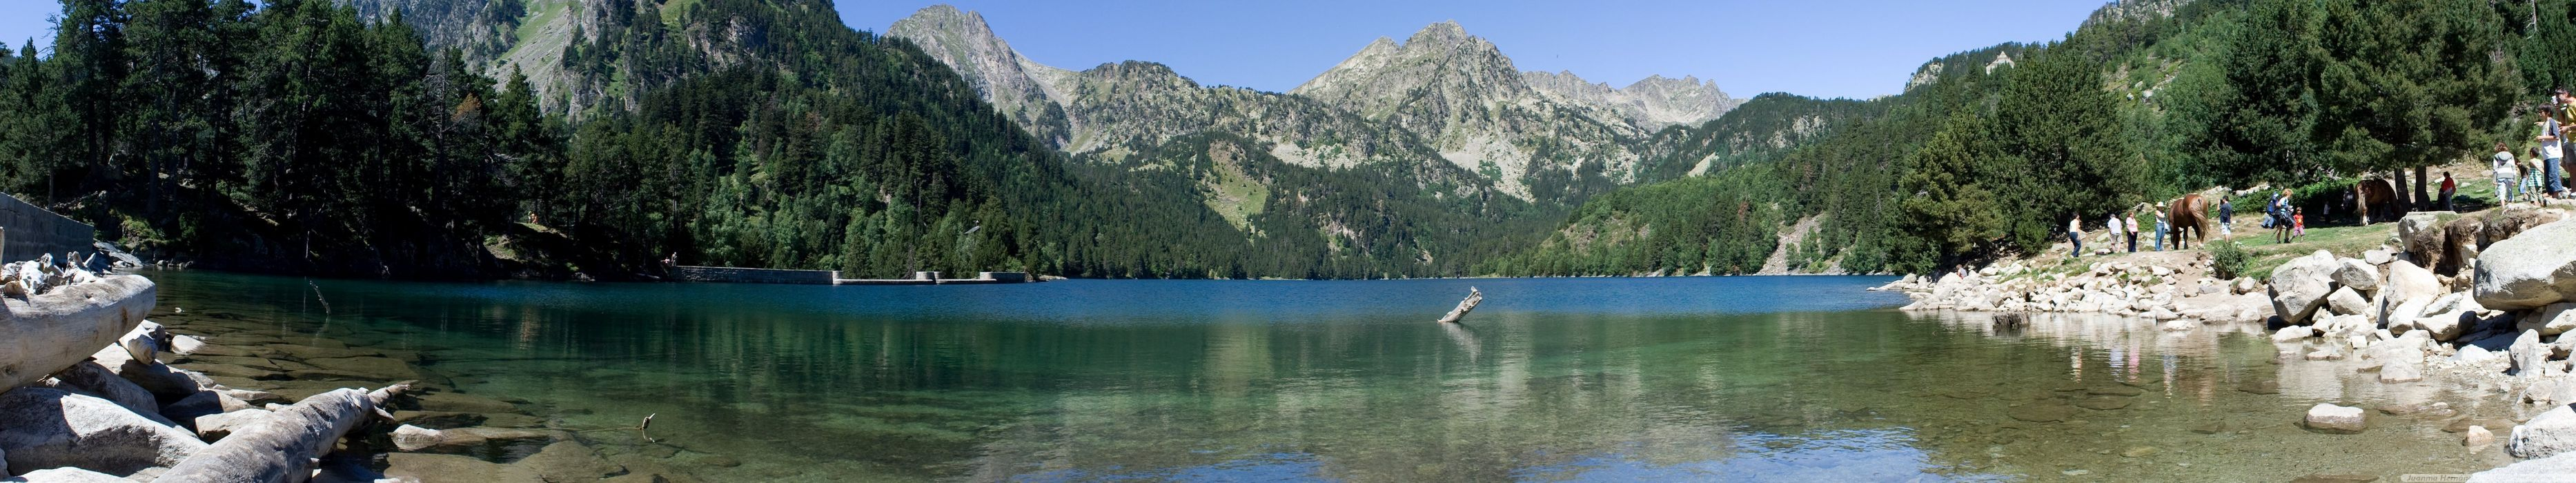 triple monitor multi screen multiple montagne mountains lacs lakes wallpaper